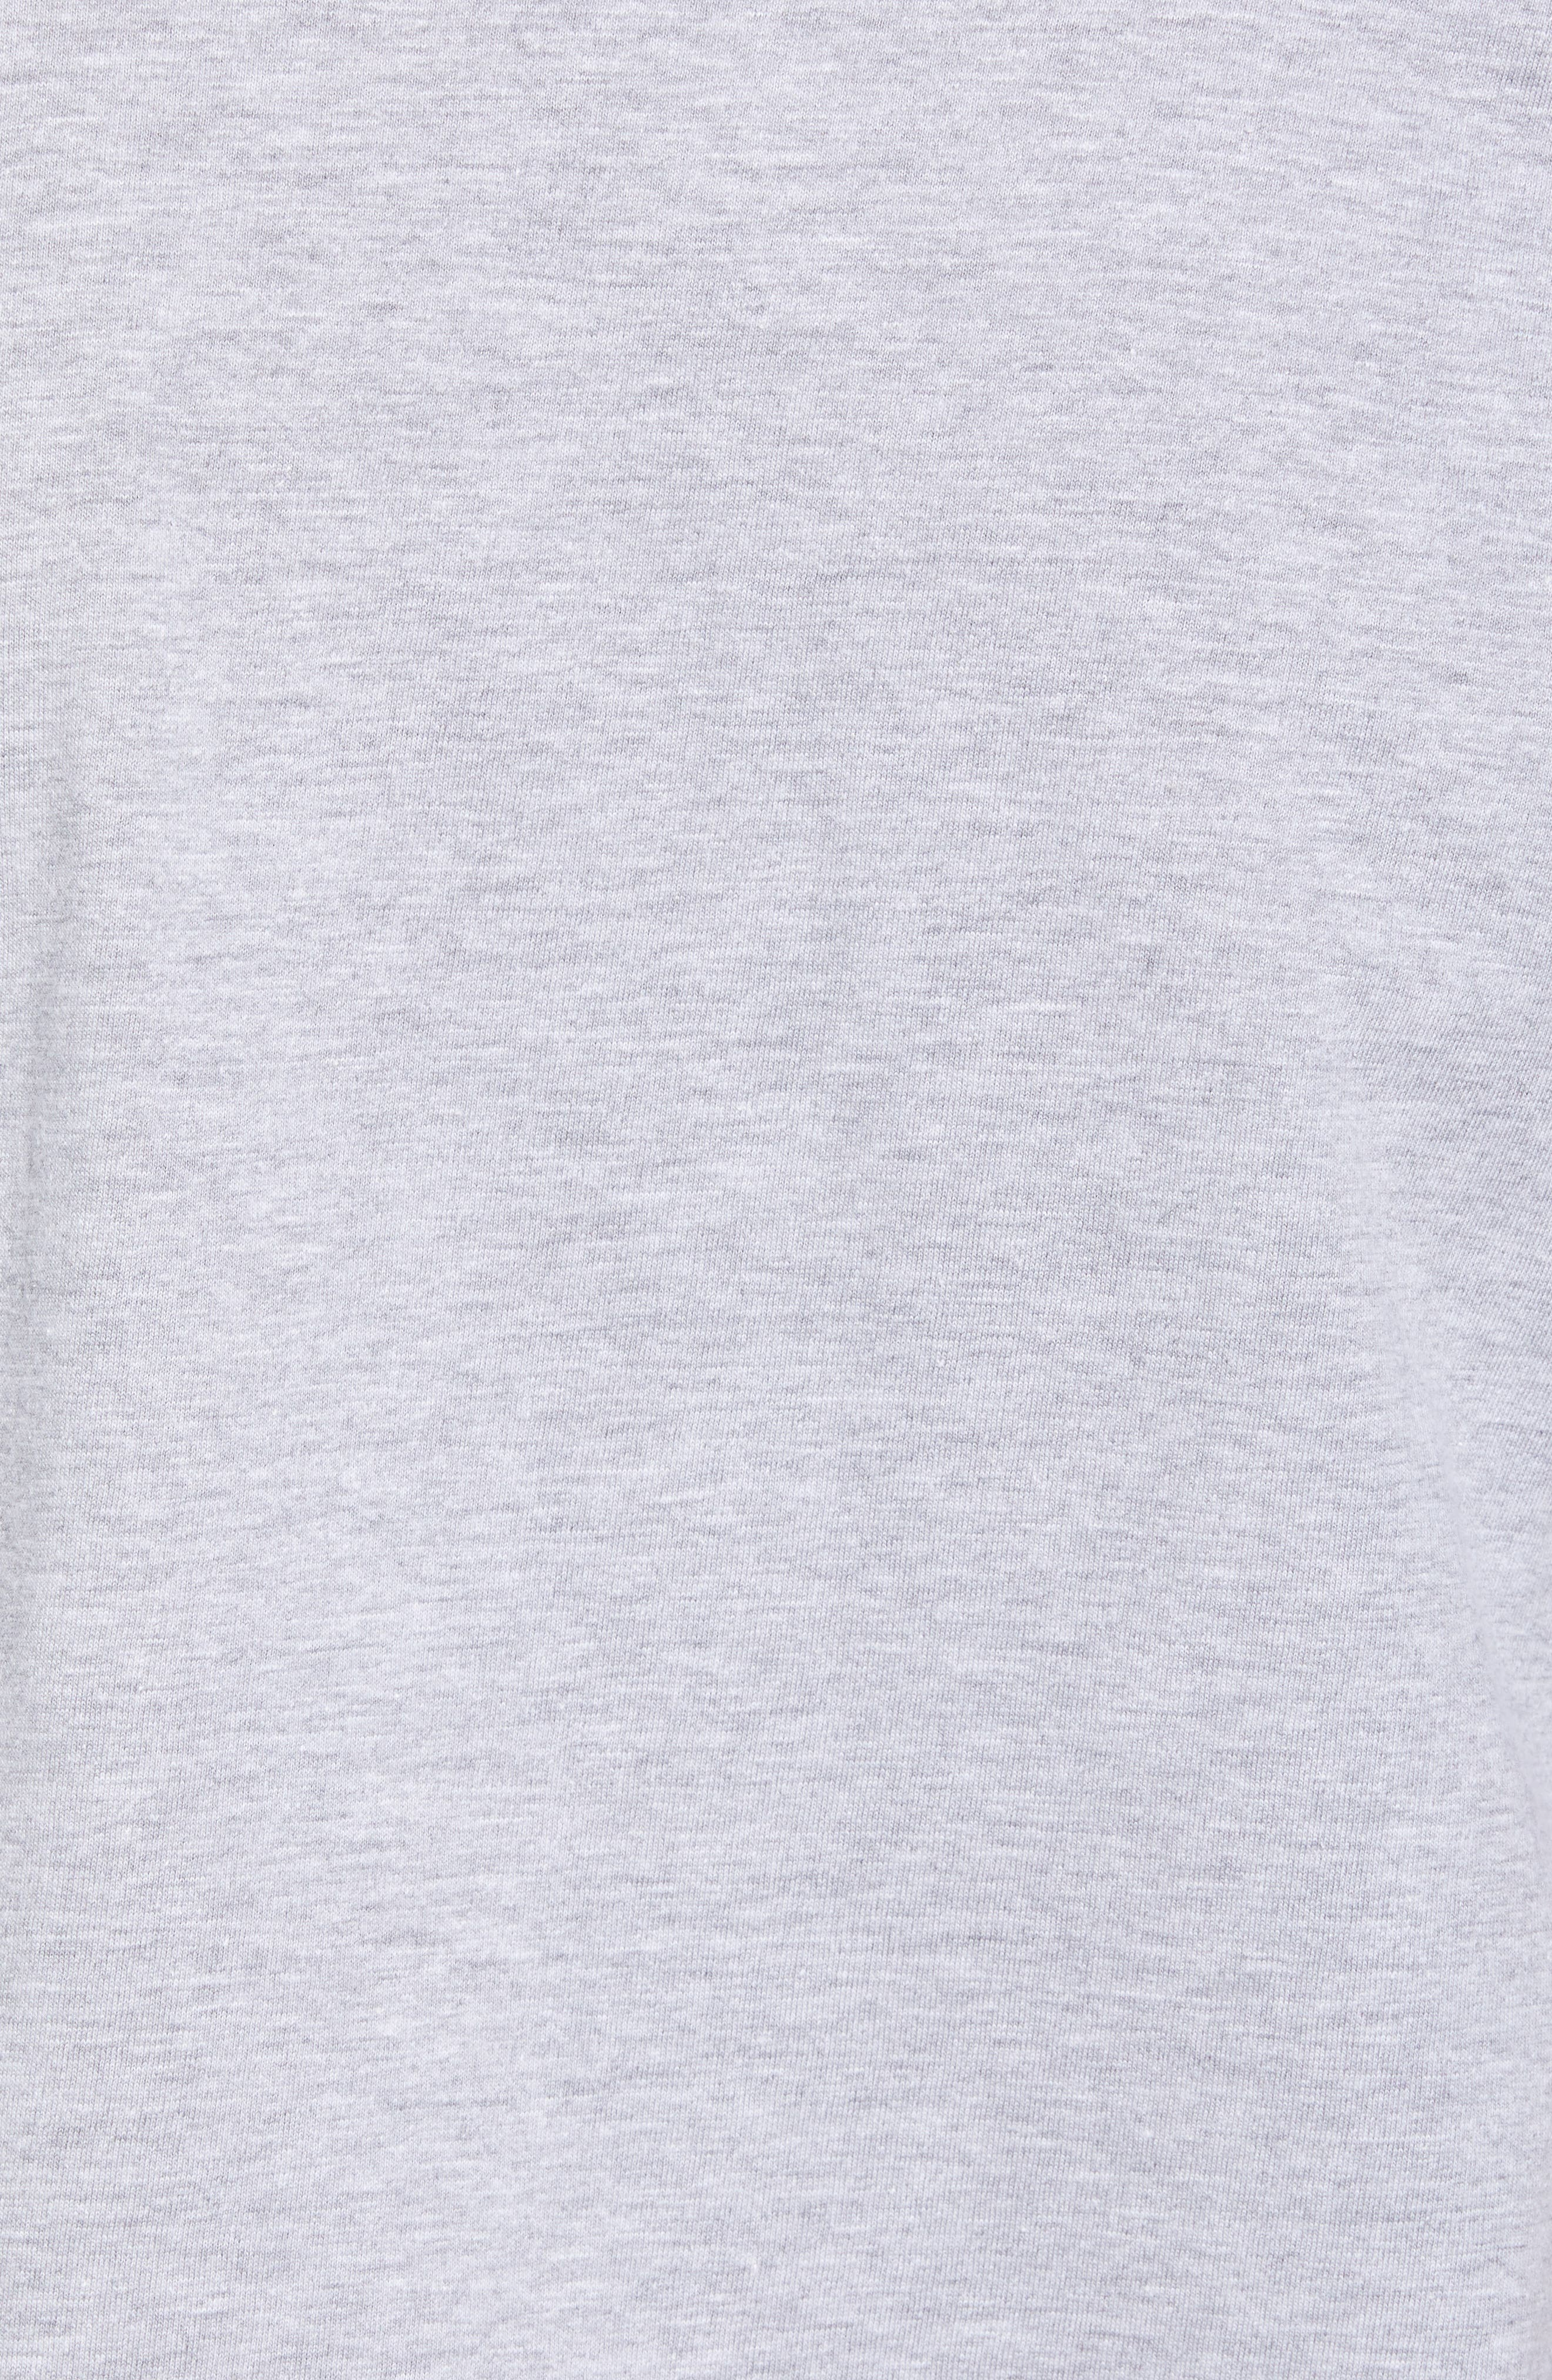 PNW Mountains Graphic T-Shirt,                             Alternate thumbnail 5, color,                             020